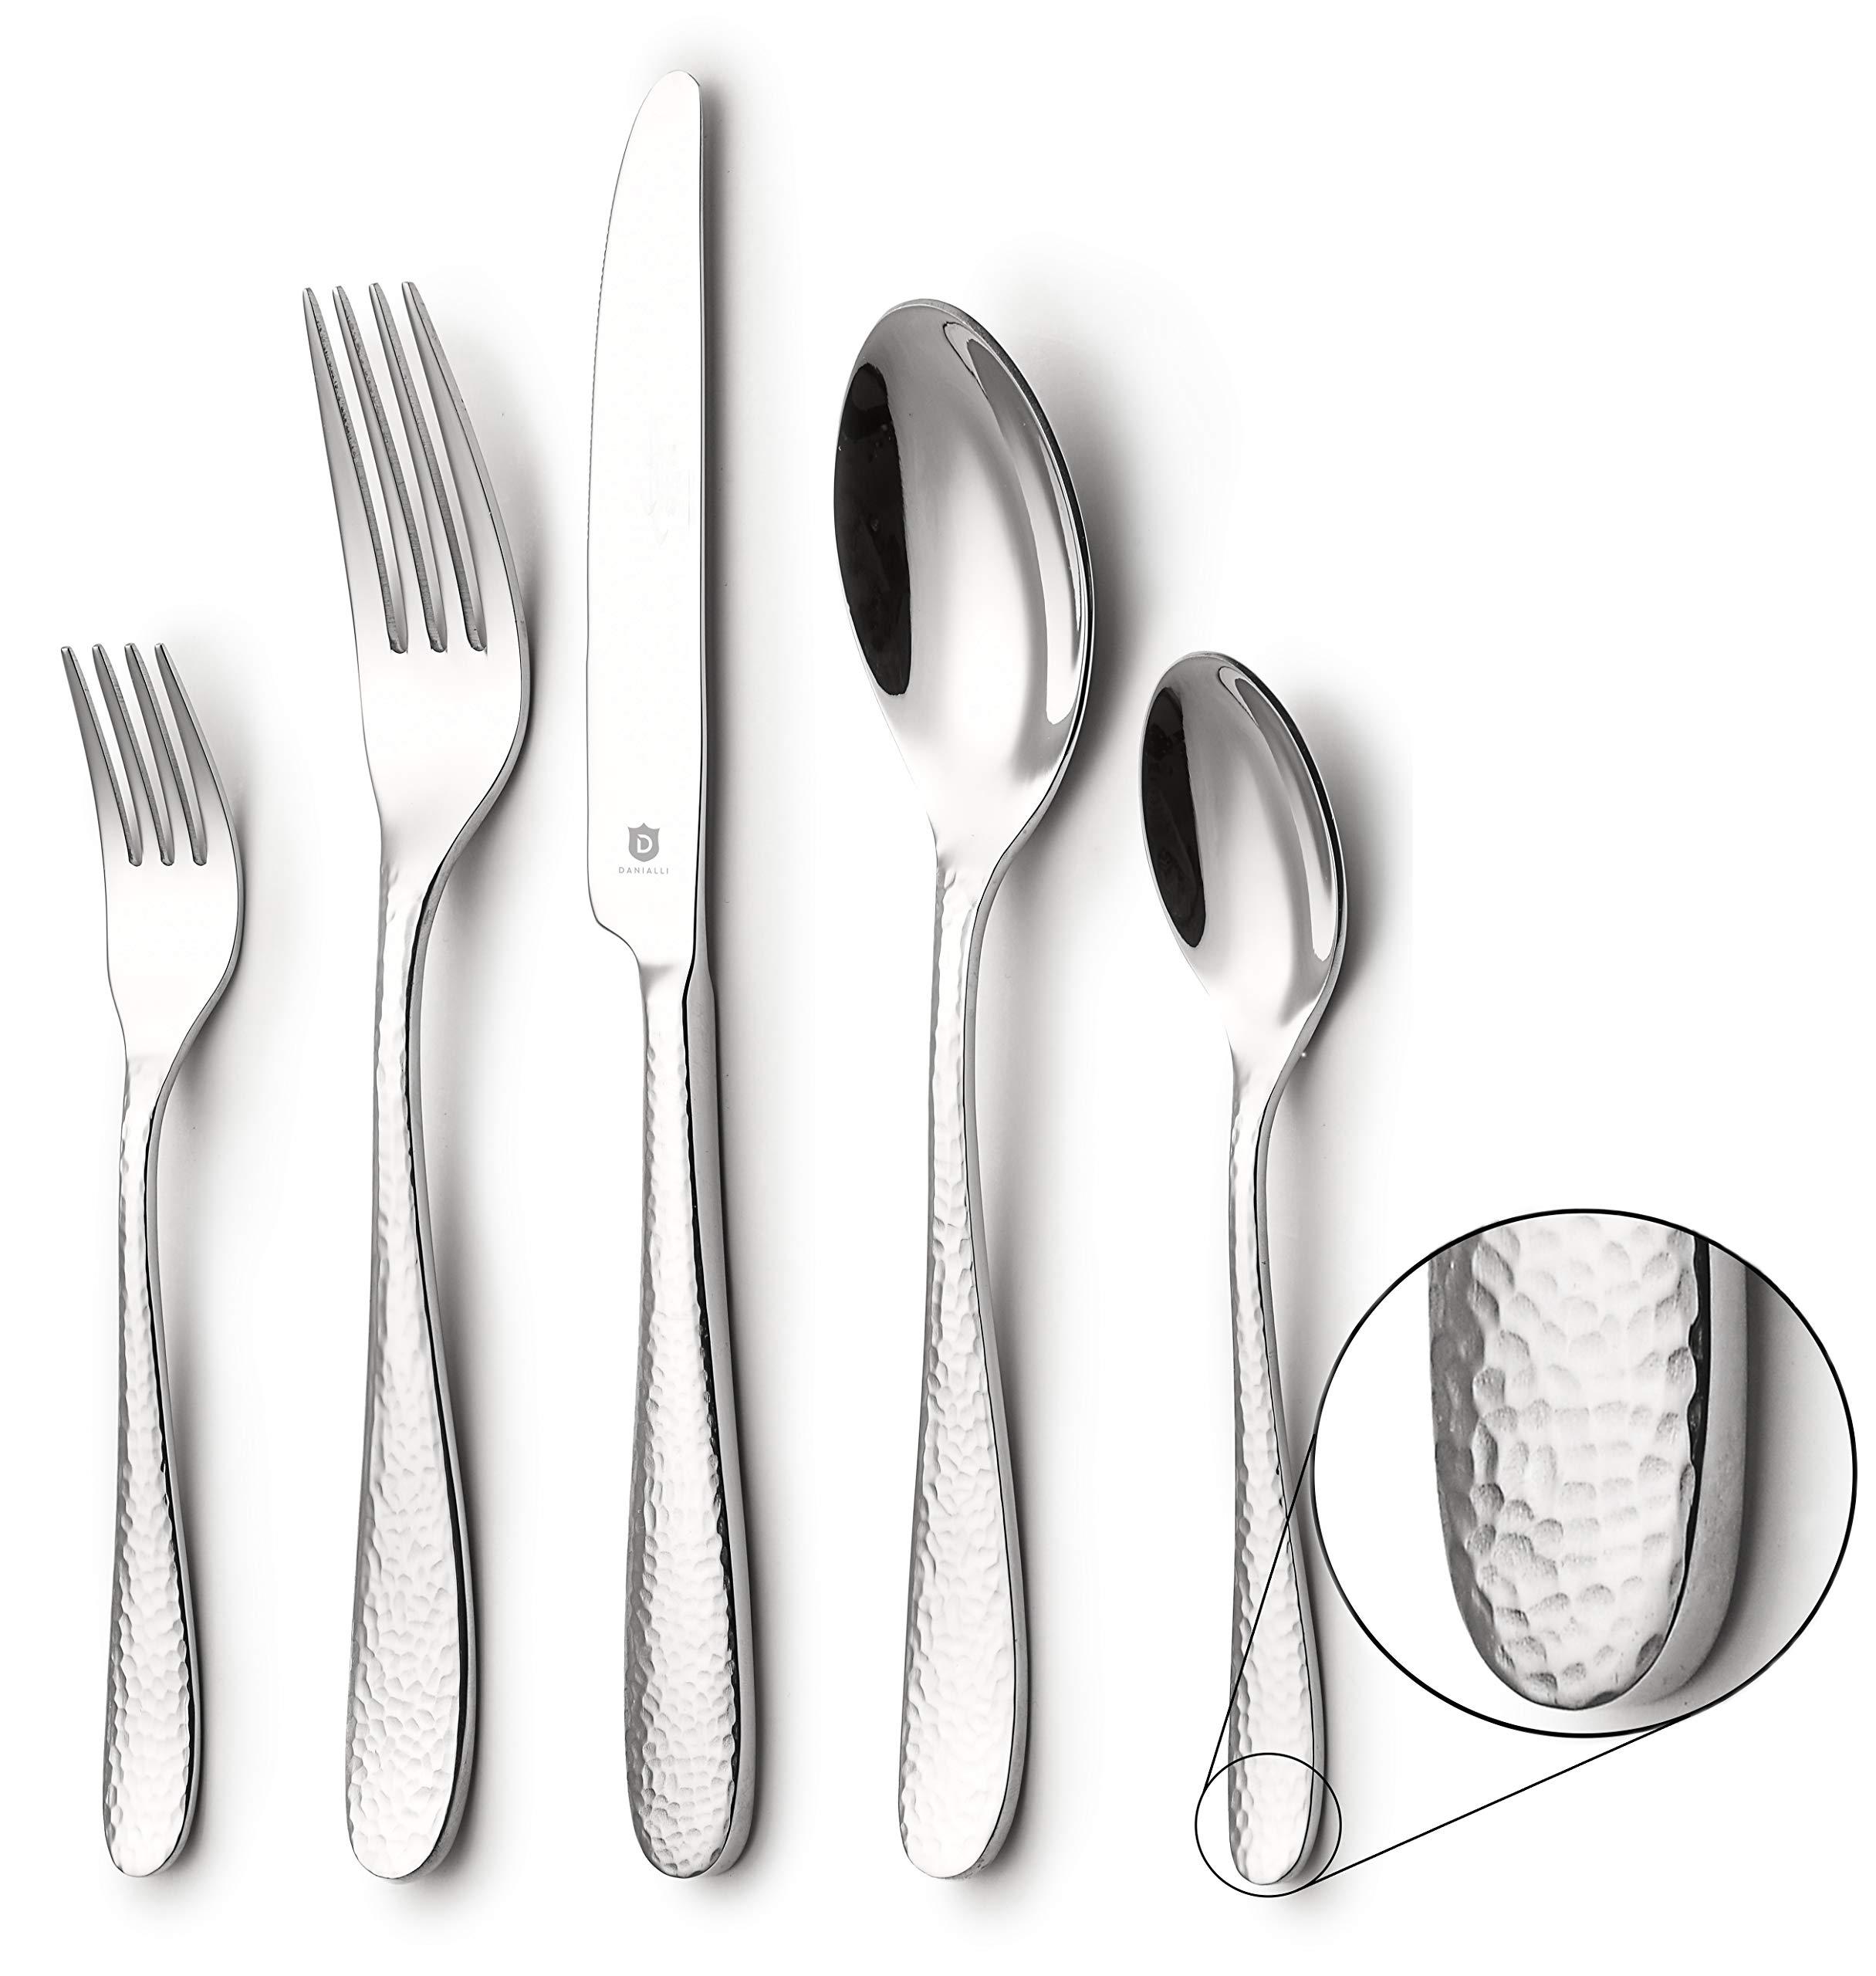 DANIALLI 20-Piece Flatware Set For 4, Modern Hammered Design Silverware Set, 18 10 Stainless Steel Utensils, Include Knife/Fork/Spoon, Mirror Polished Set of Cutlery, Dishwasher Safe